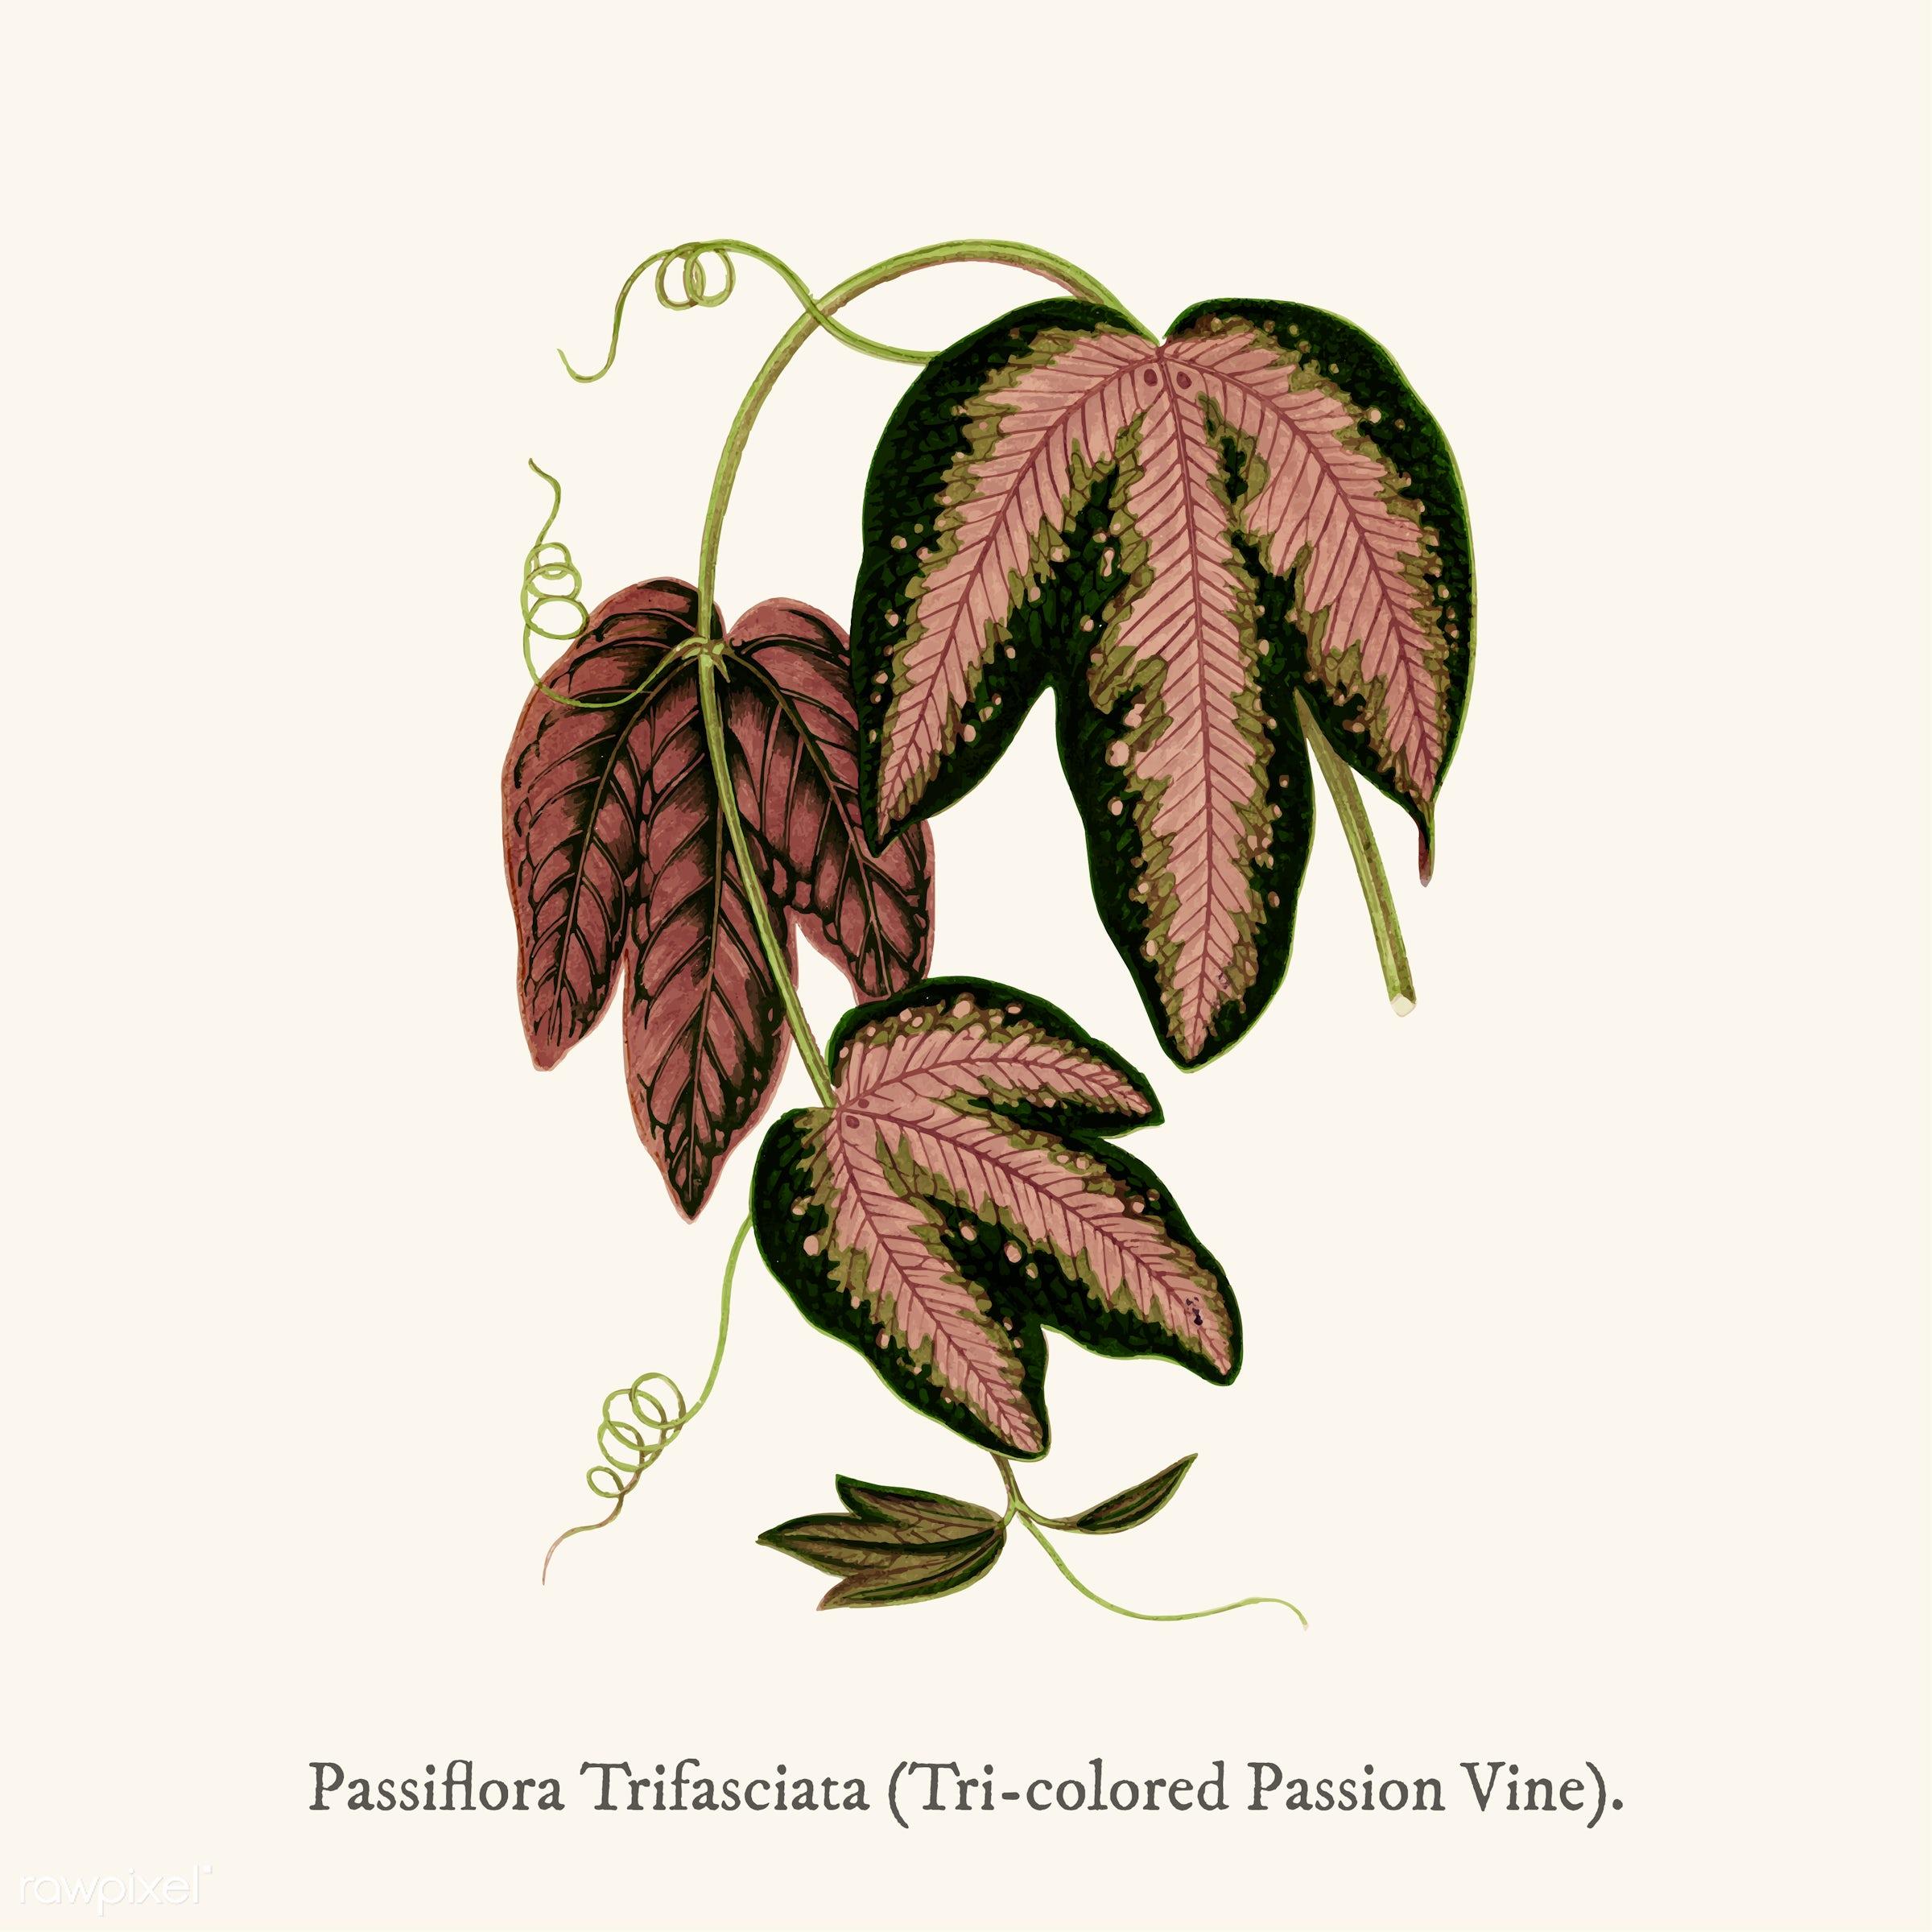 leaf, pattern, ancient, antique, decorate, decoration, design, drawing, graphic, illustration, leaves, nature, passiflora,...